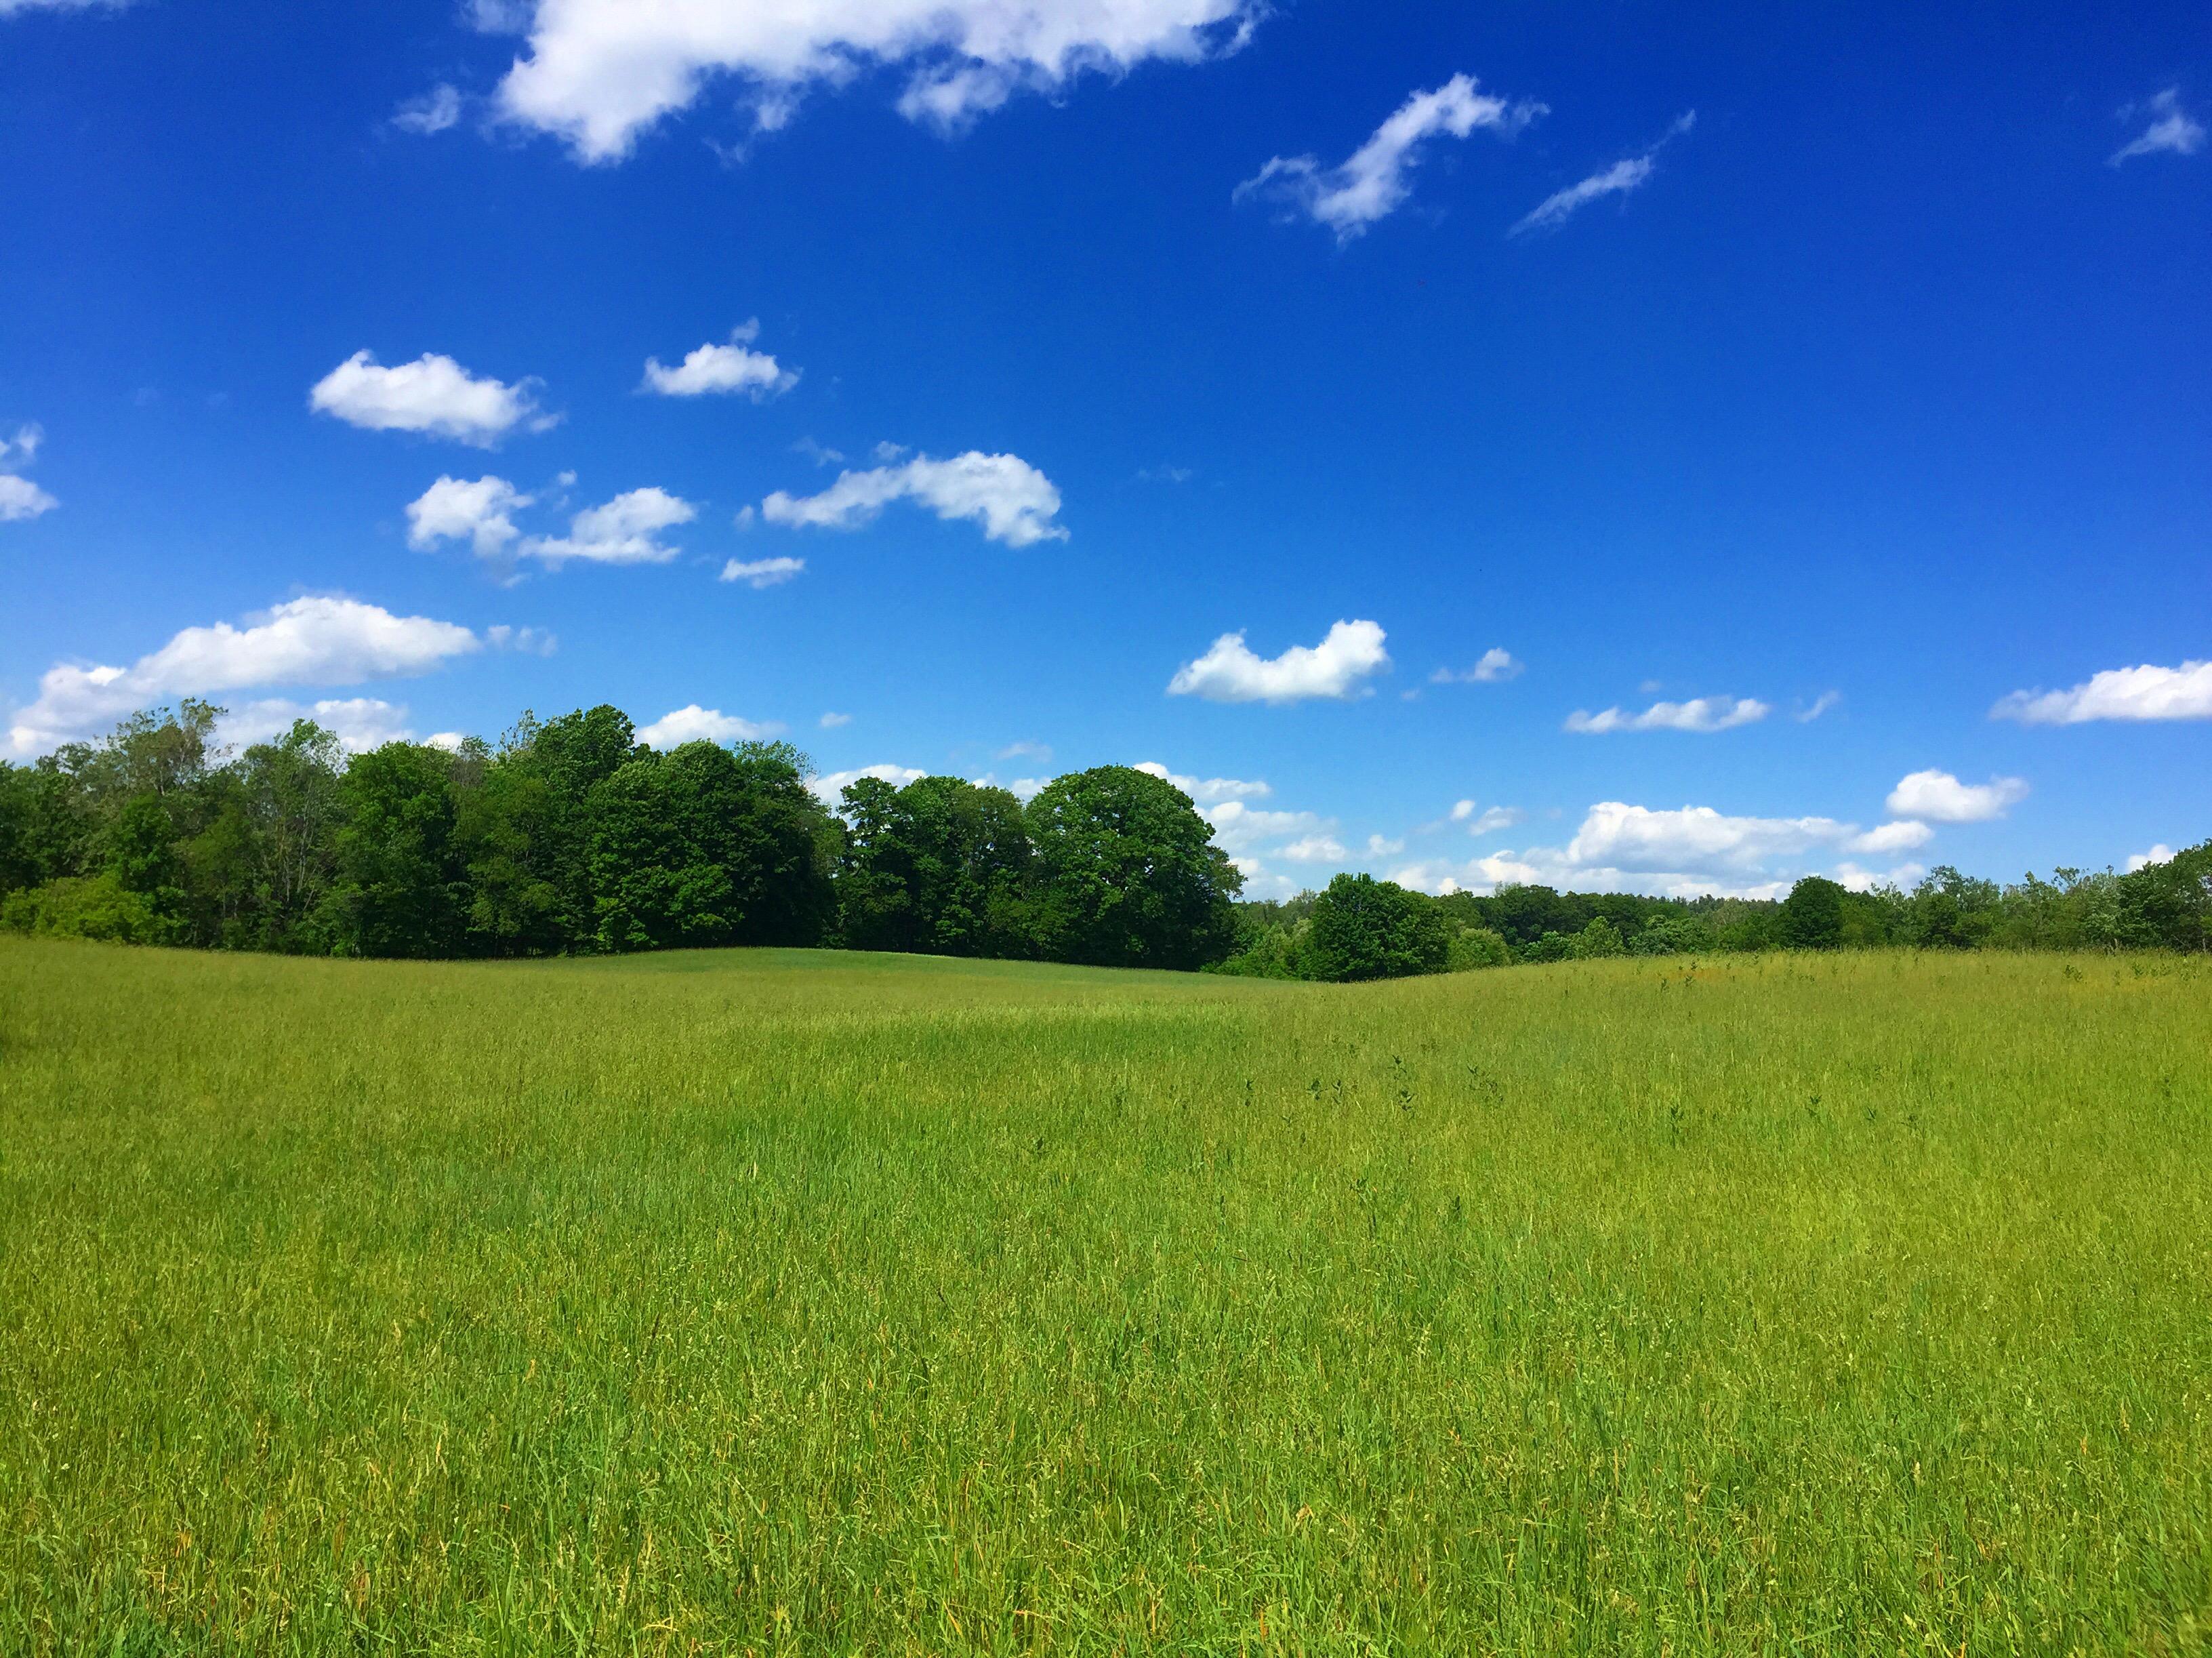 file:green field blue sky clouds - wikimedia commons